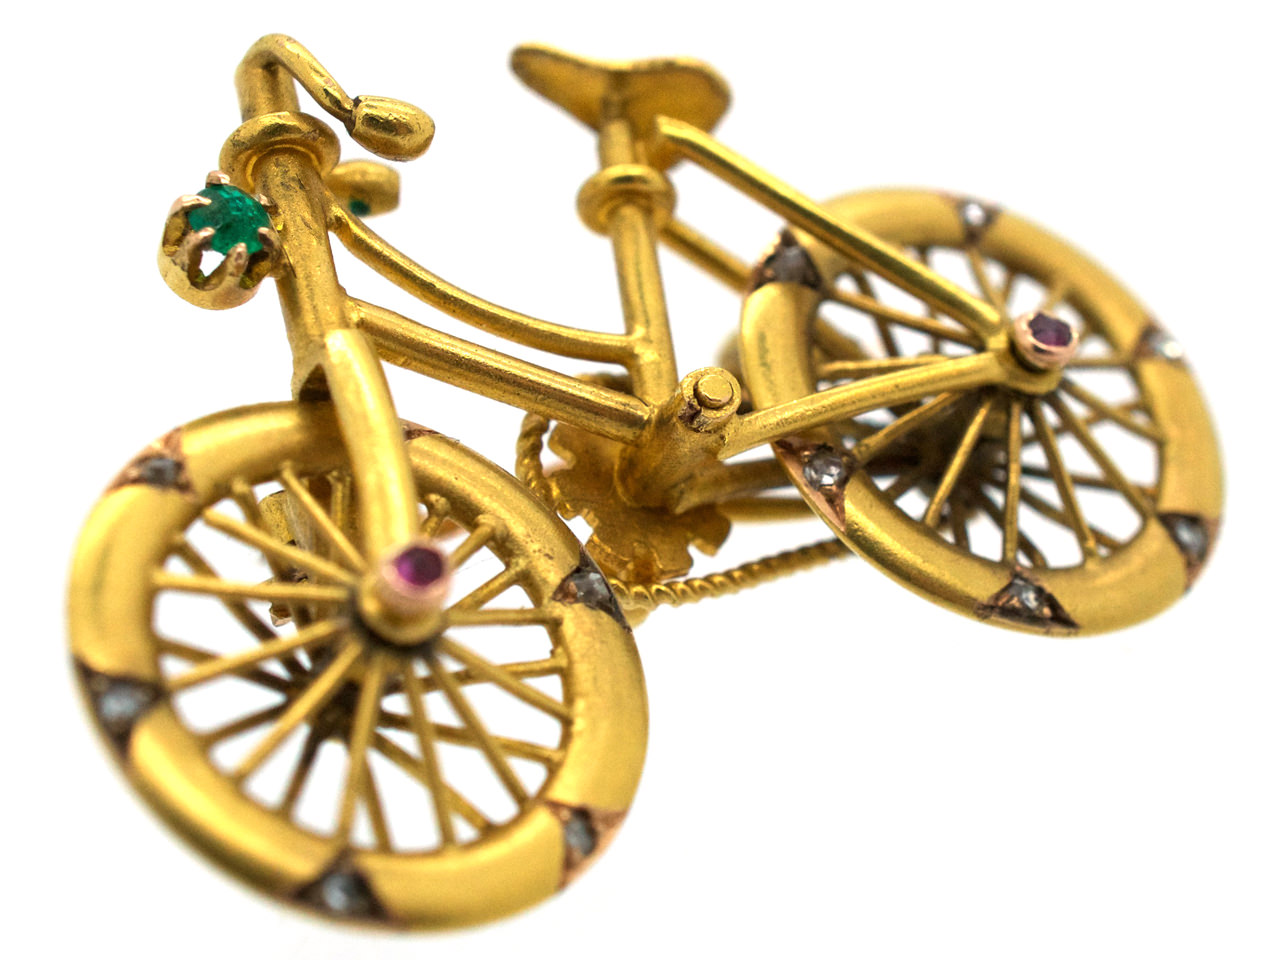 Austrian 14ct Gold & Gem Set Bicycle Brooch